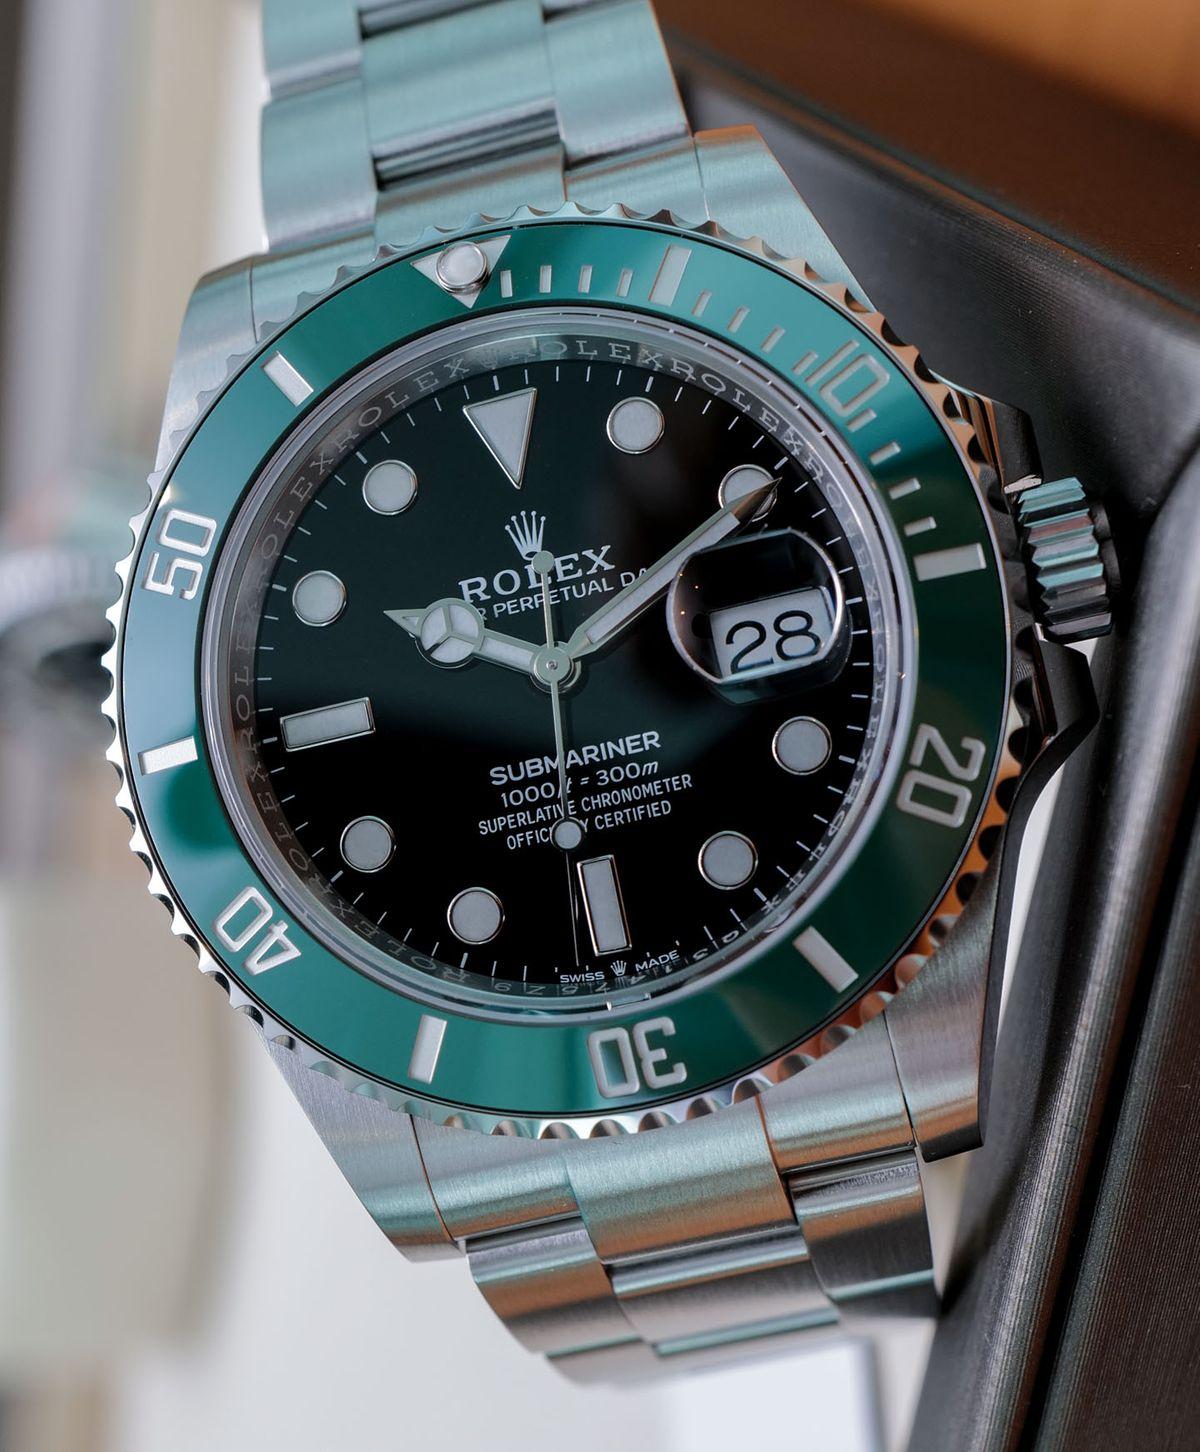 Rolex Submariner Green 126610LV Stainless Steel